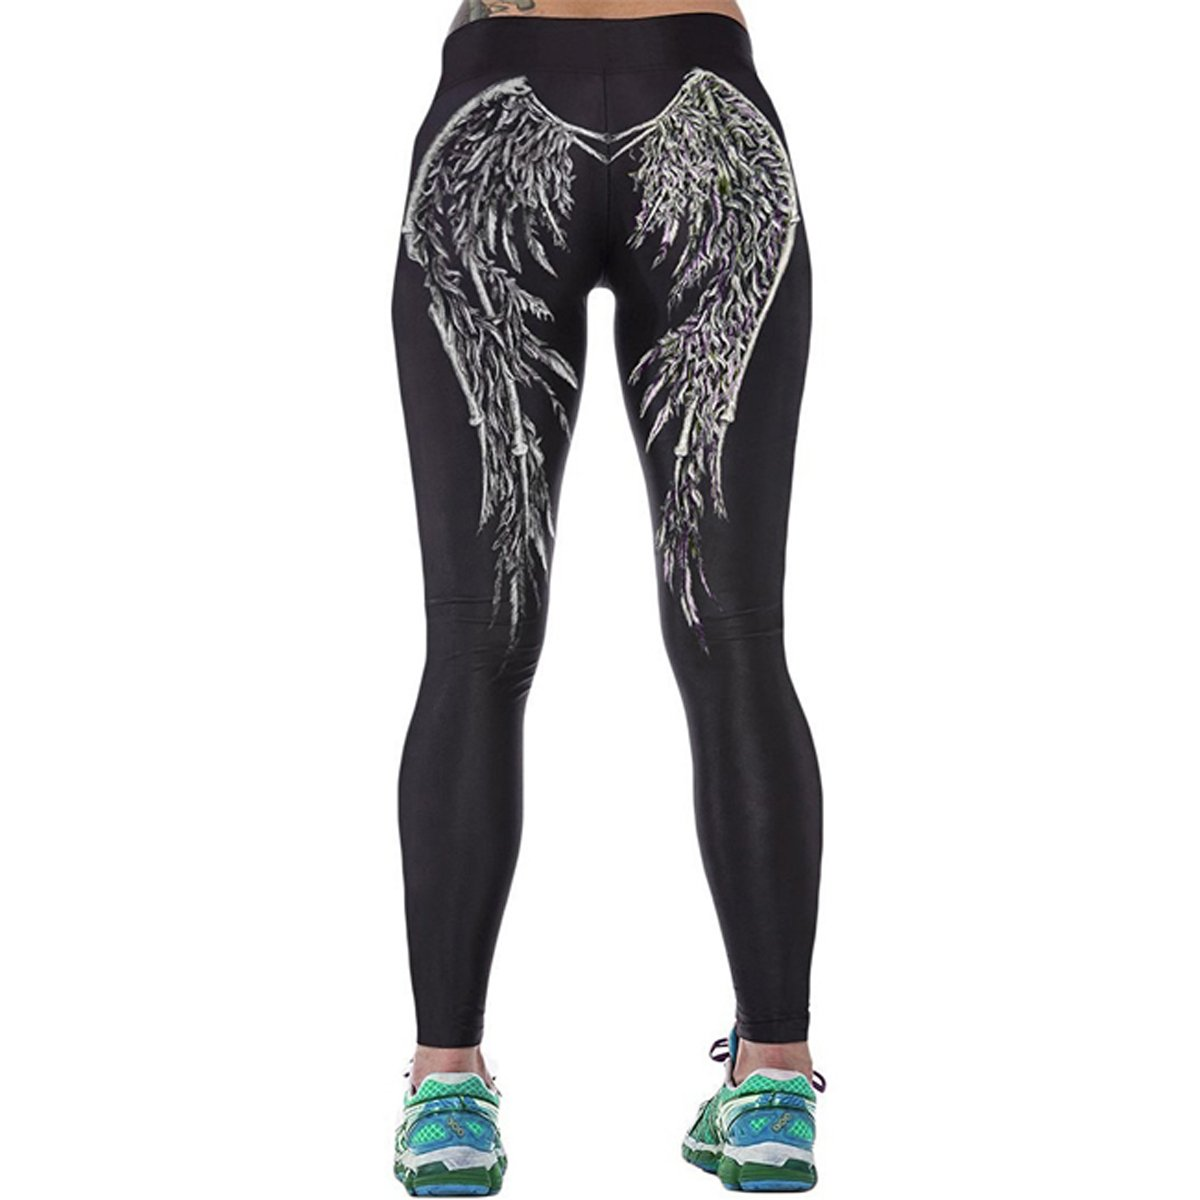 Ayliss® Damen 3D Druck Leggins Leggings Print Aufdruck Muster Leggins Tattoo Leggings Stretch Hose Strumpfhosen Yoga Sport Pants, S/L/2XL ([Tag Size S]=EU 30-32, #Flügel)